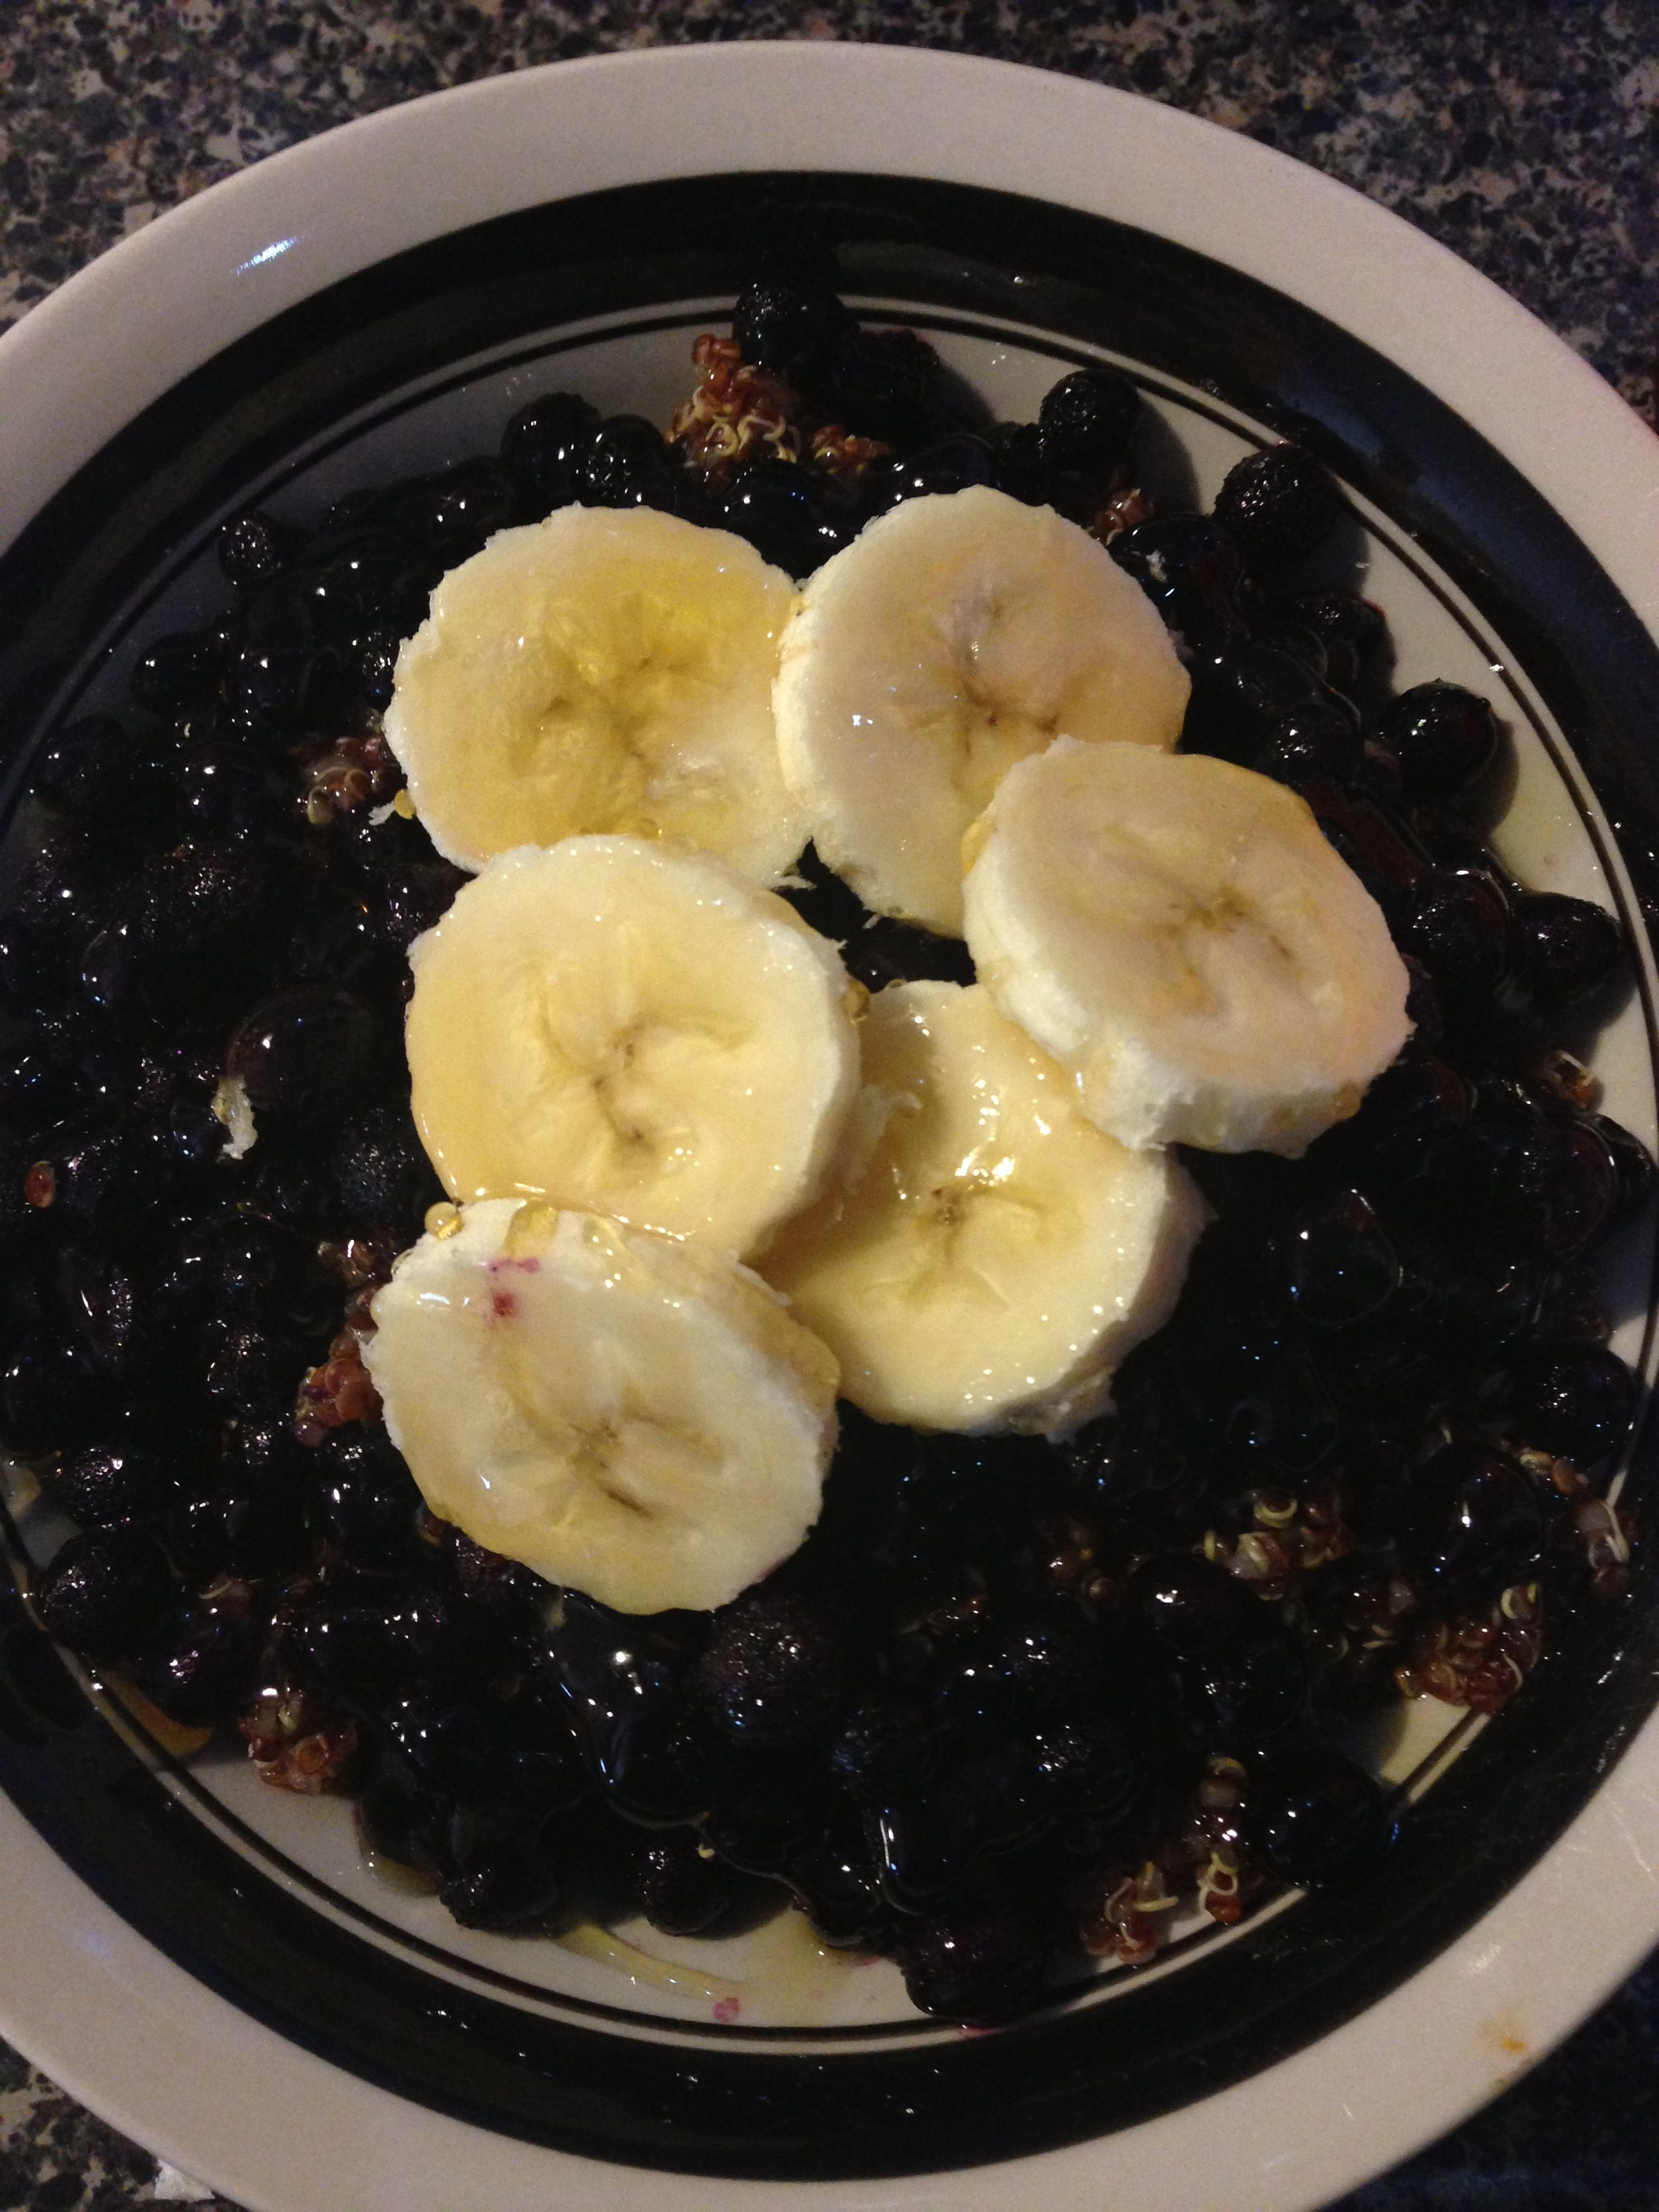 Quinoa, frozen blueberries, bananas, honey.